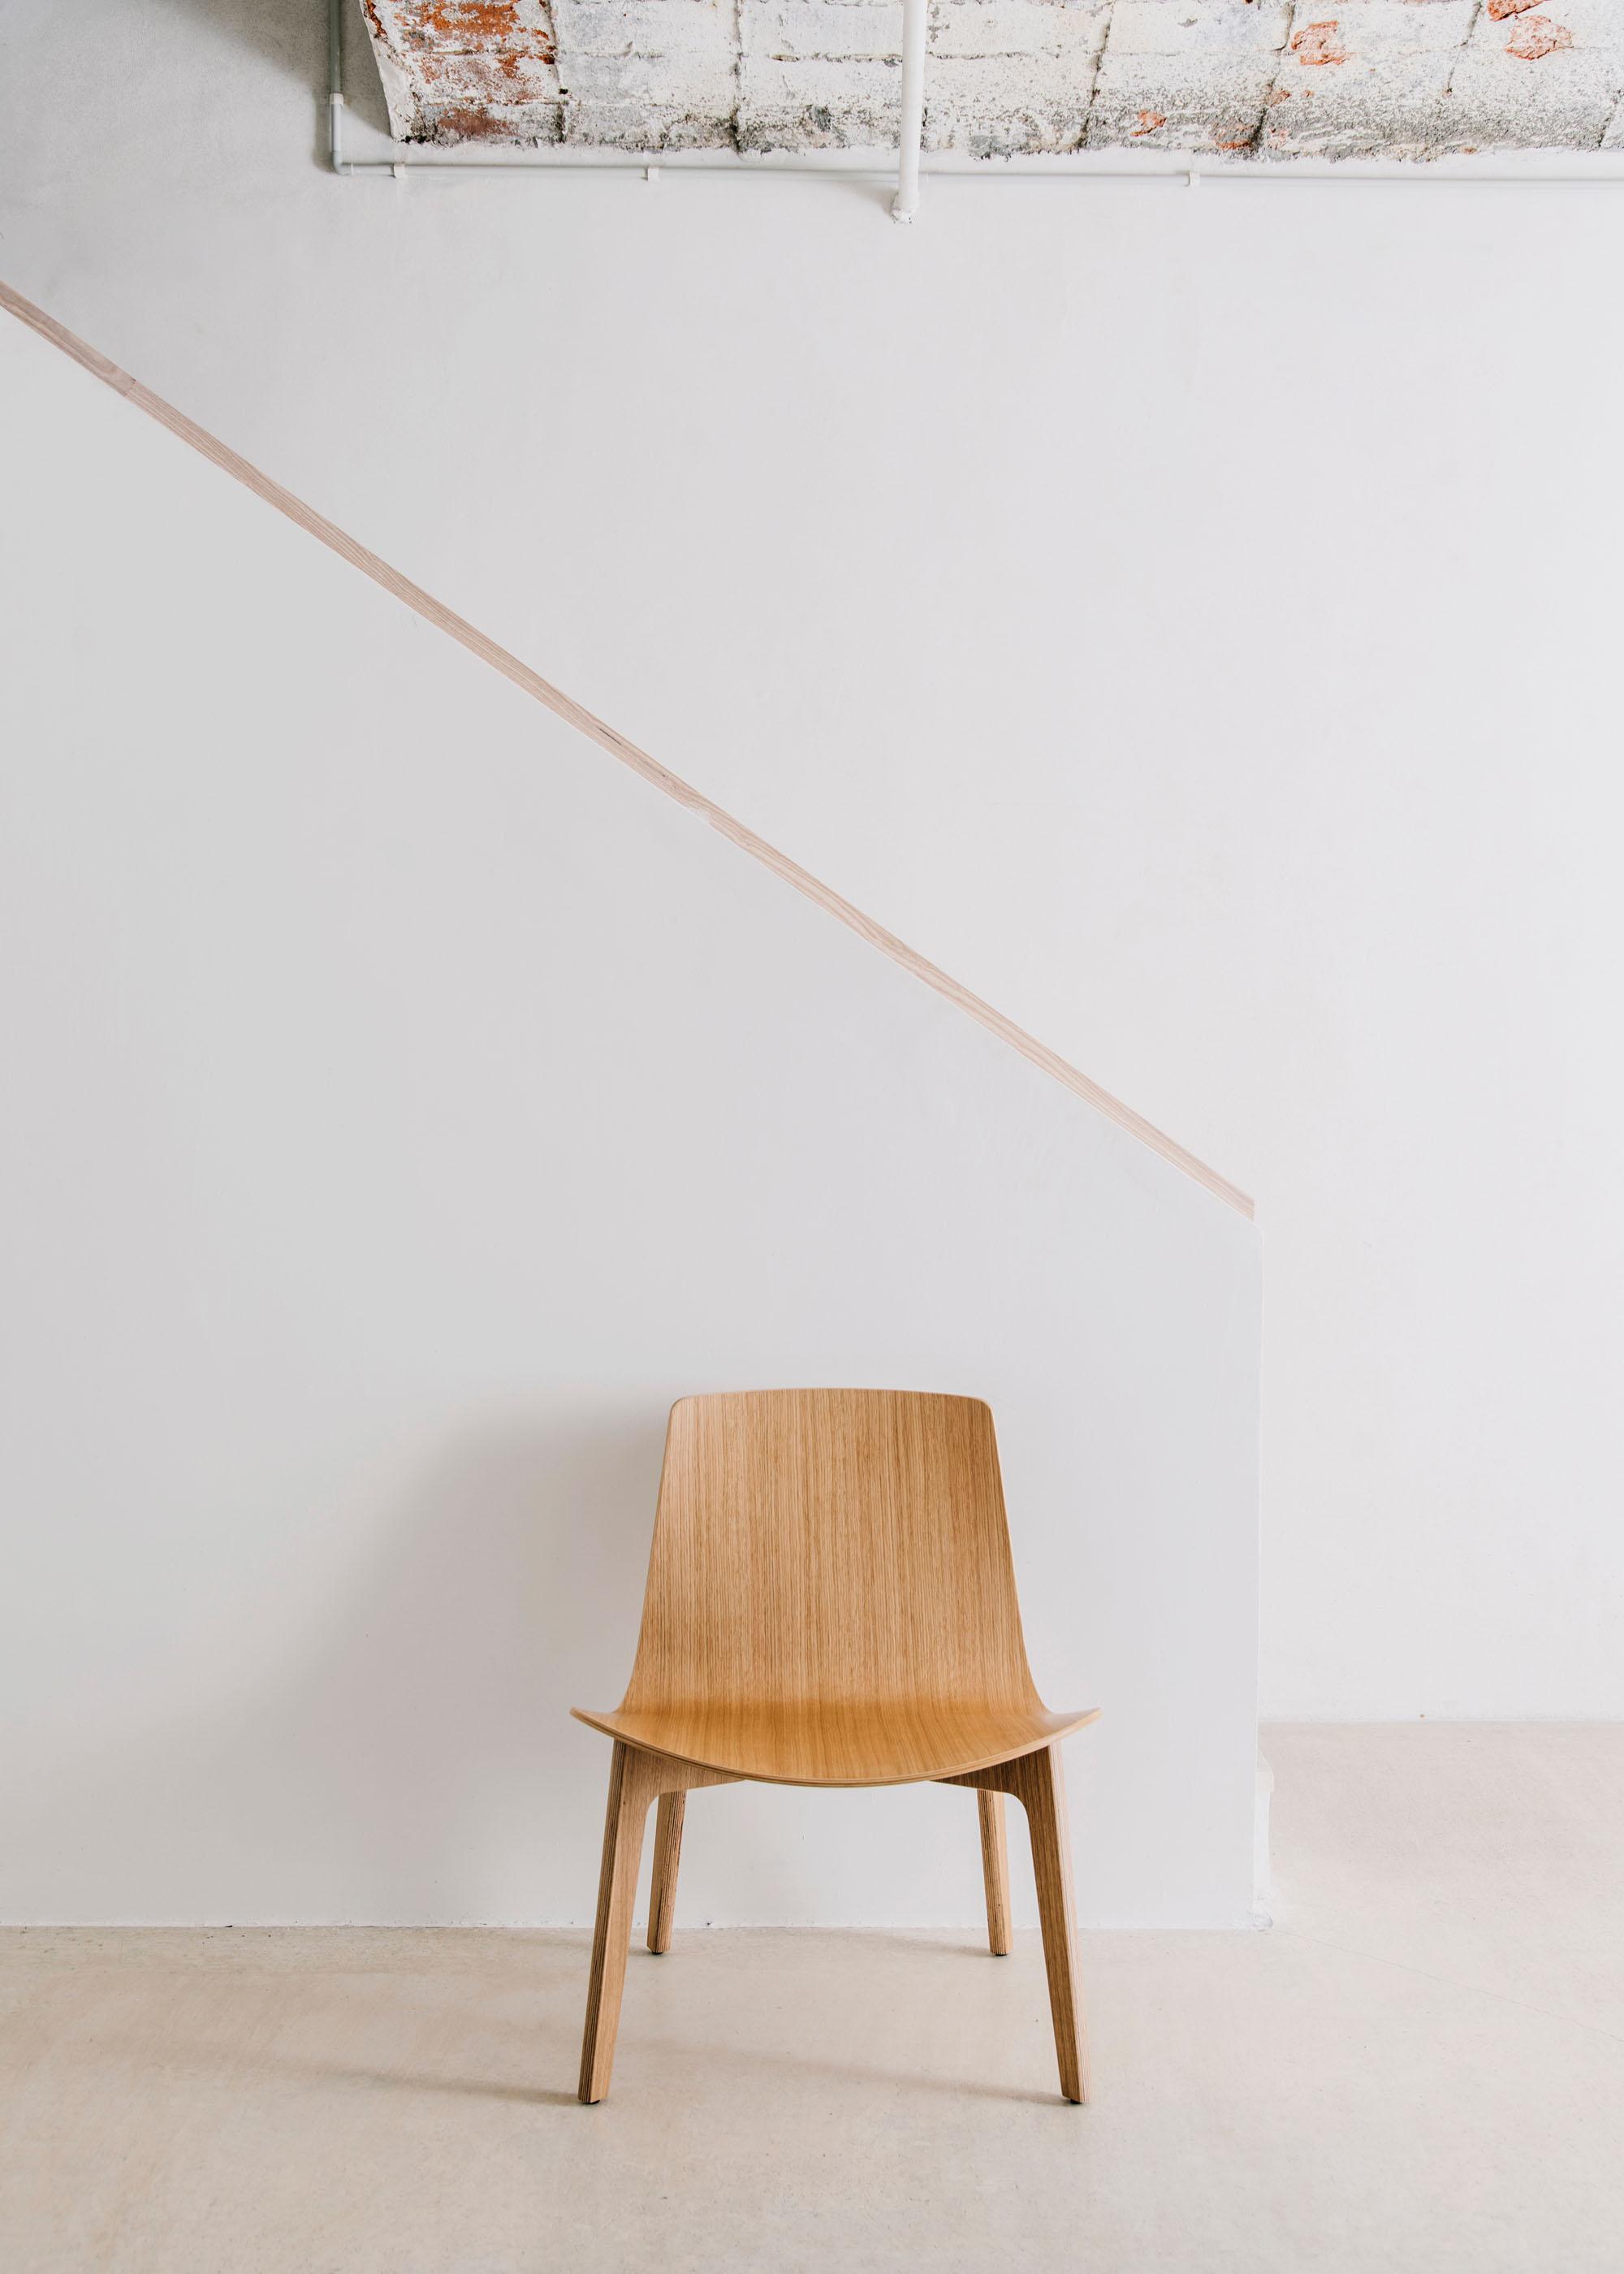 #furniture #enea #design #clase #basque #chairs #montoya